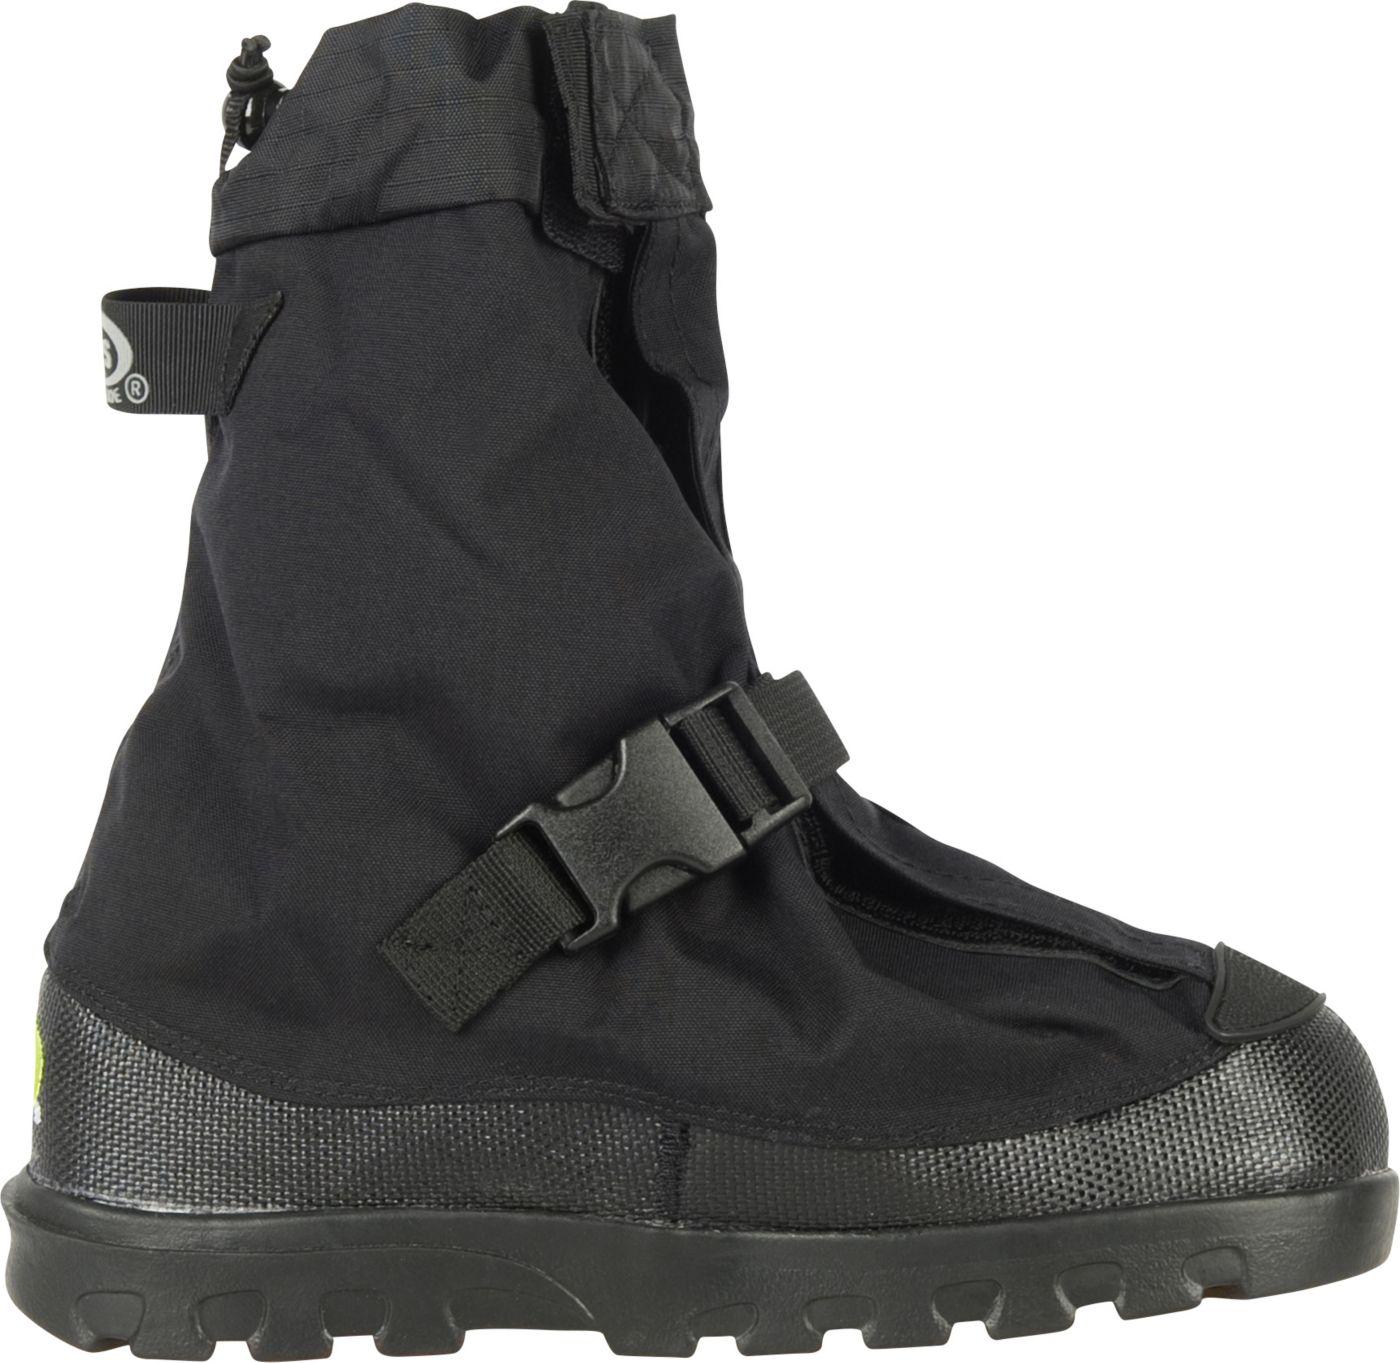 NEOS Adult Voyager Waterproof Overshoes